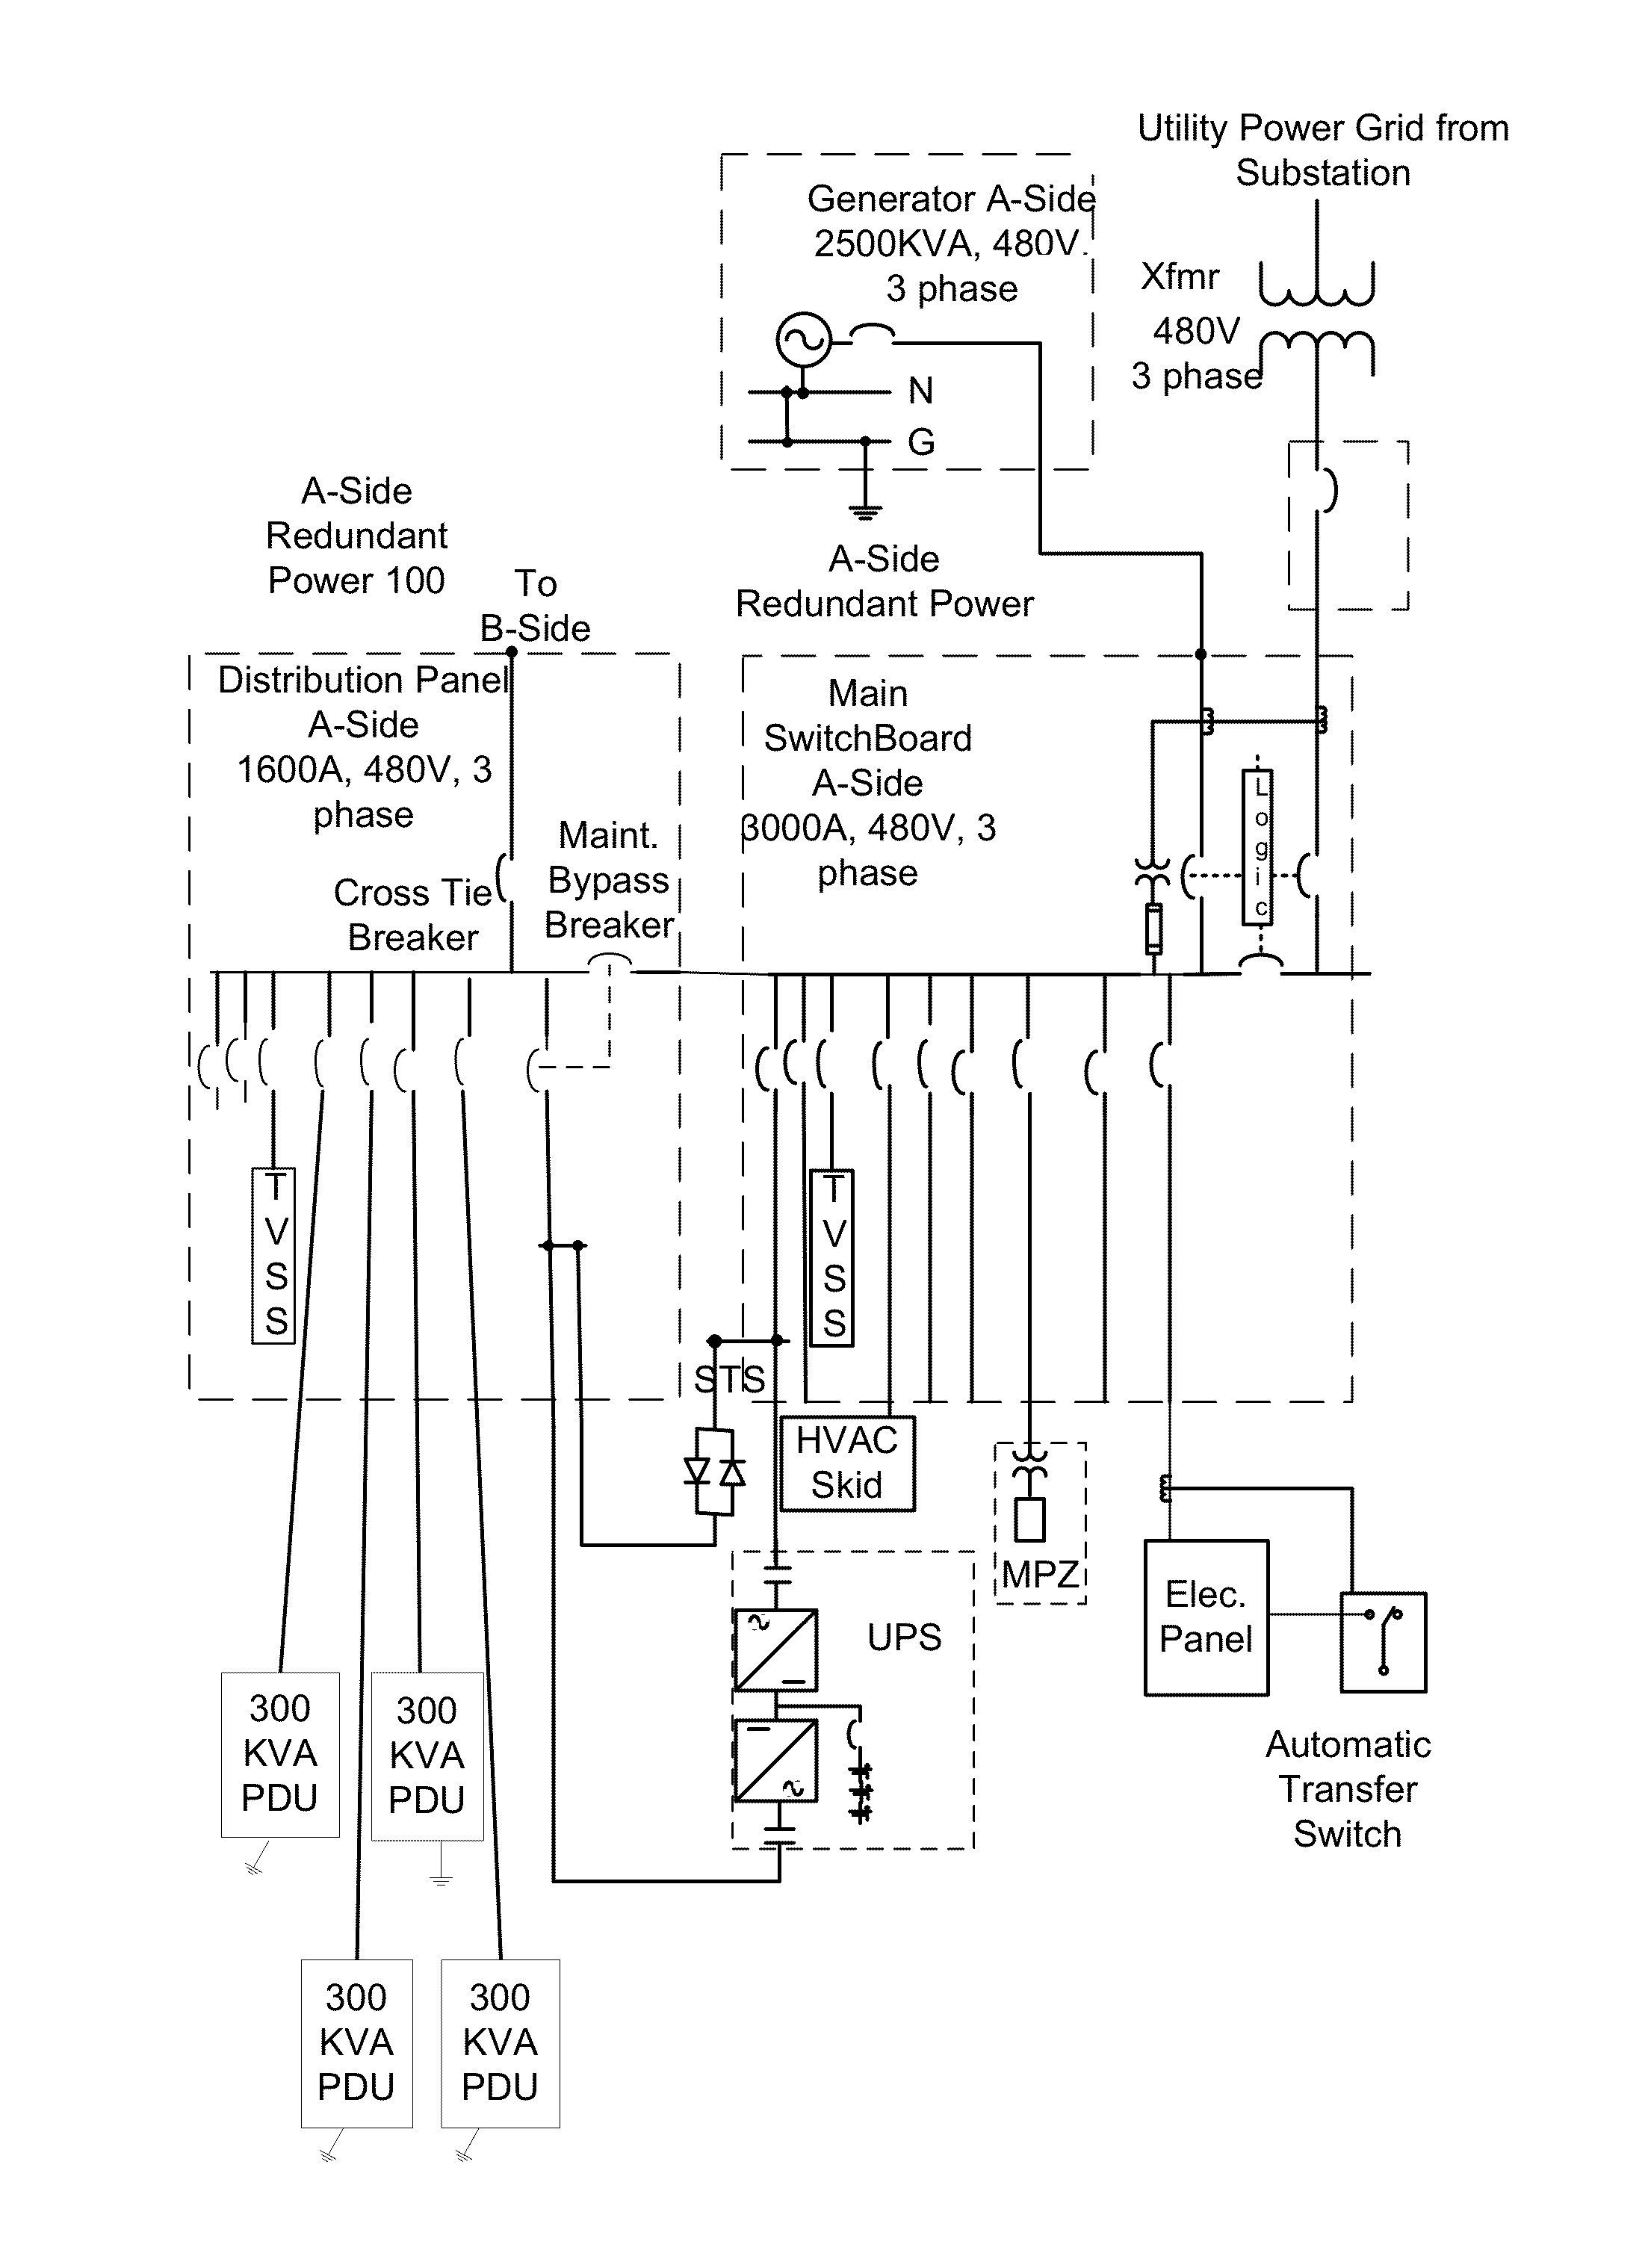 Diagram Wiringdiagram Diagramming Diagramm Visuals Visualisation Graphical Check More At Https Thebrontes Co Circuit Diagram Diagram Lighting Diagram